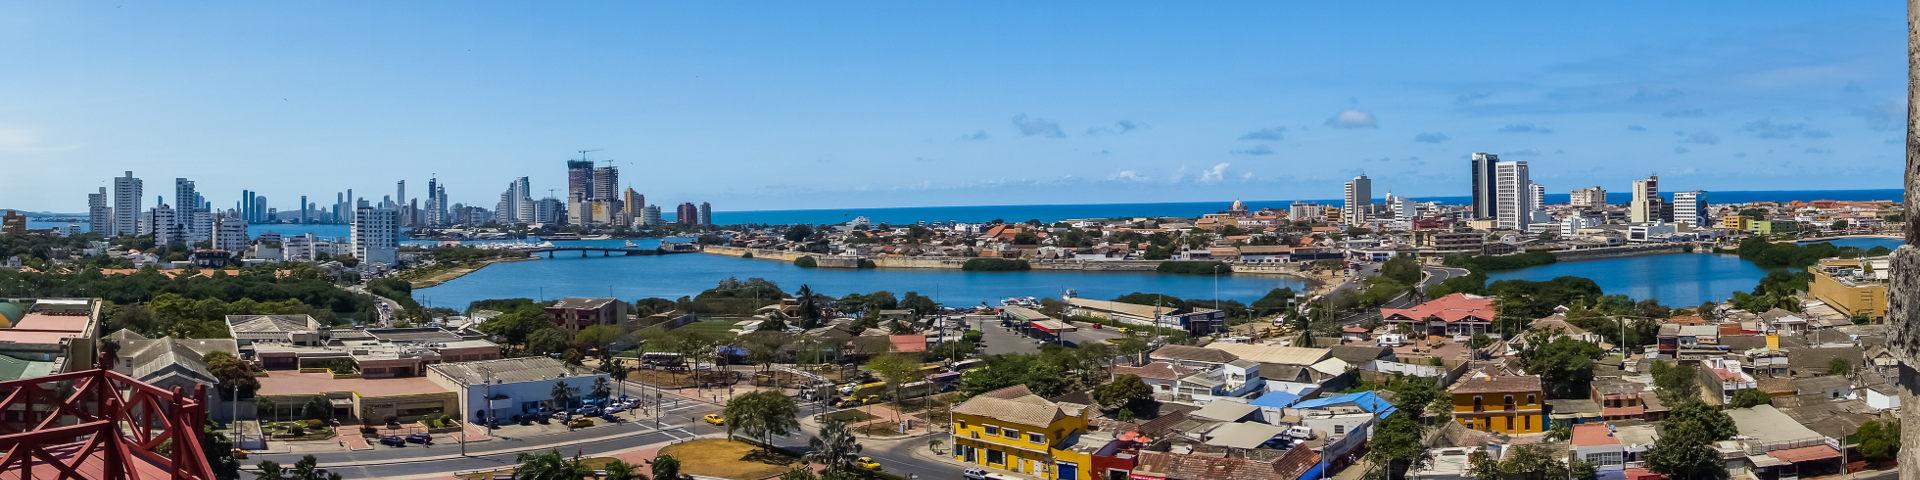 Cartagena hero banner 1